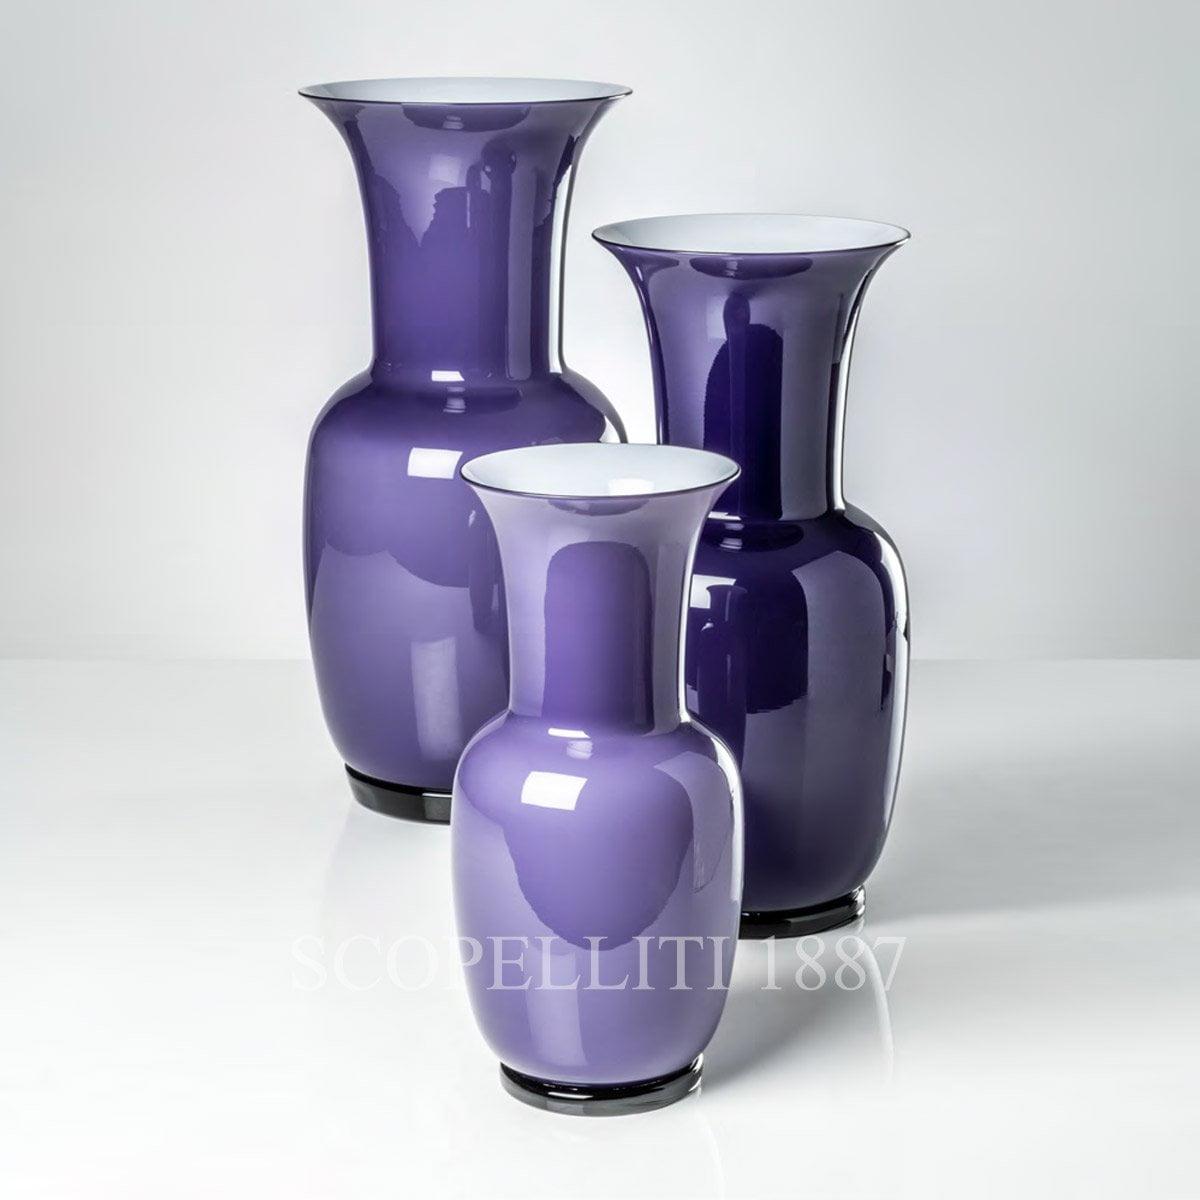 murano glass vase indigo violet